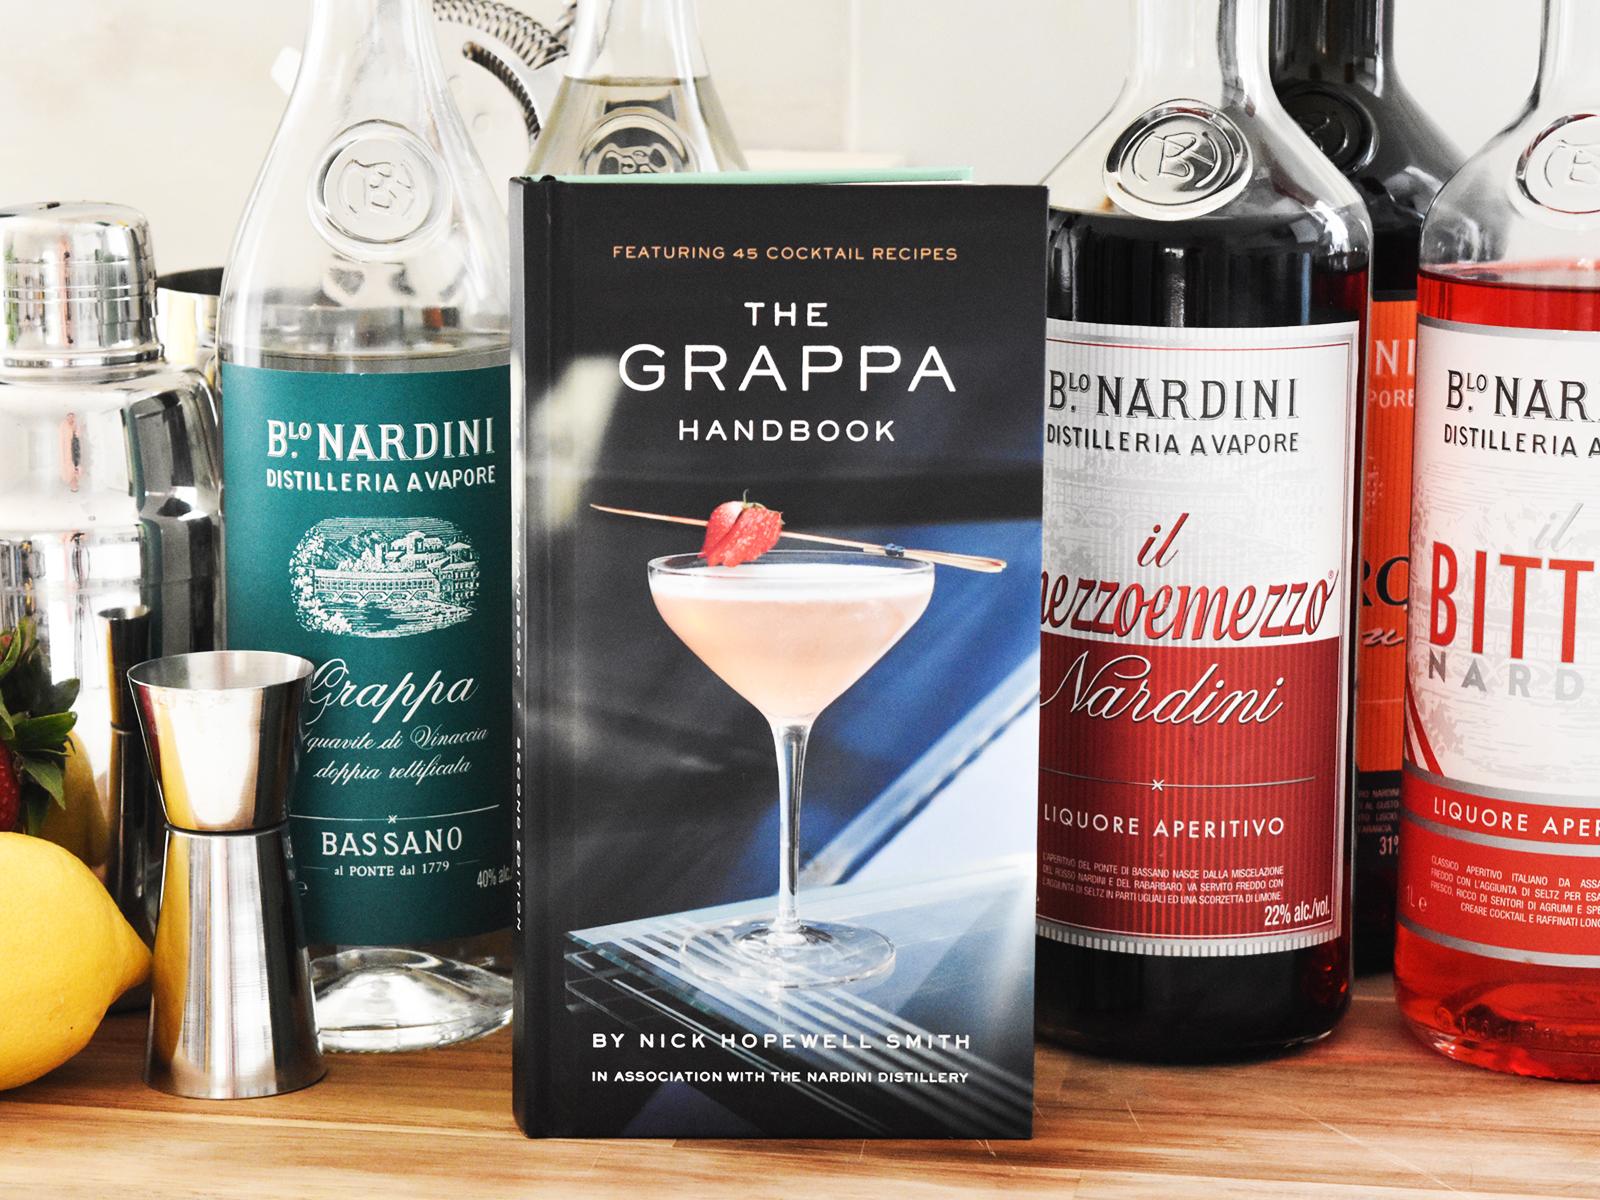 THE GRAPPA HANDBOOK - LAUNCH EVENT IN SCOTLAND